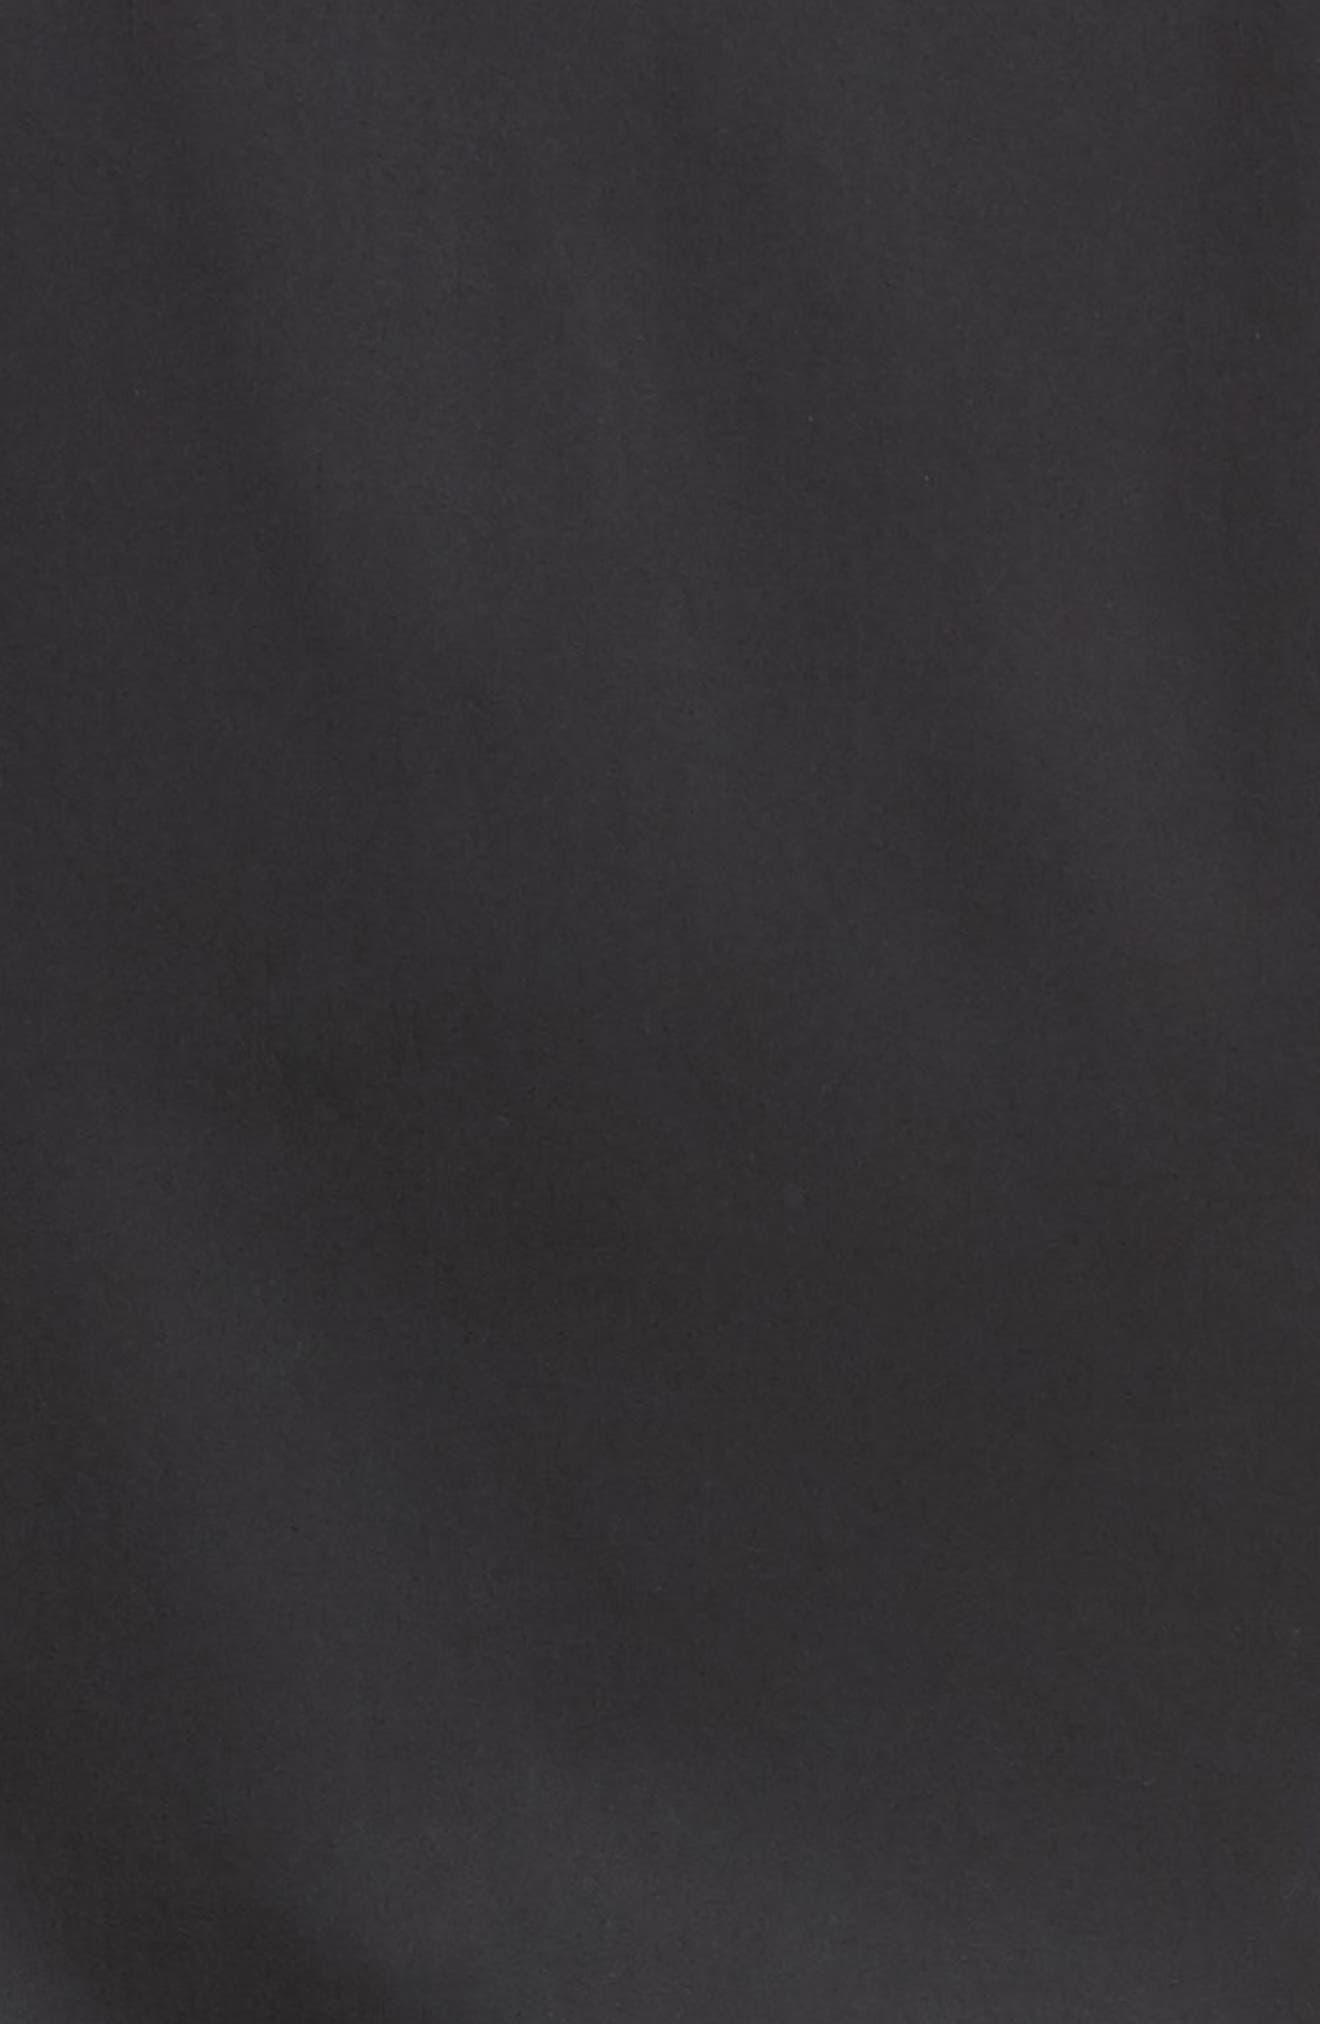 Woven & Knit Jacket,                             Alternate thumbnail 6, color,                             001